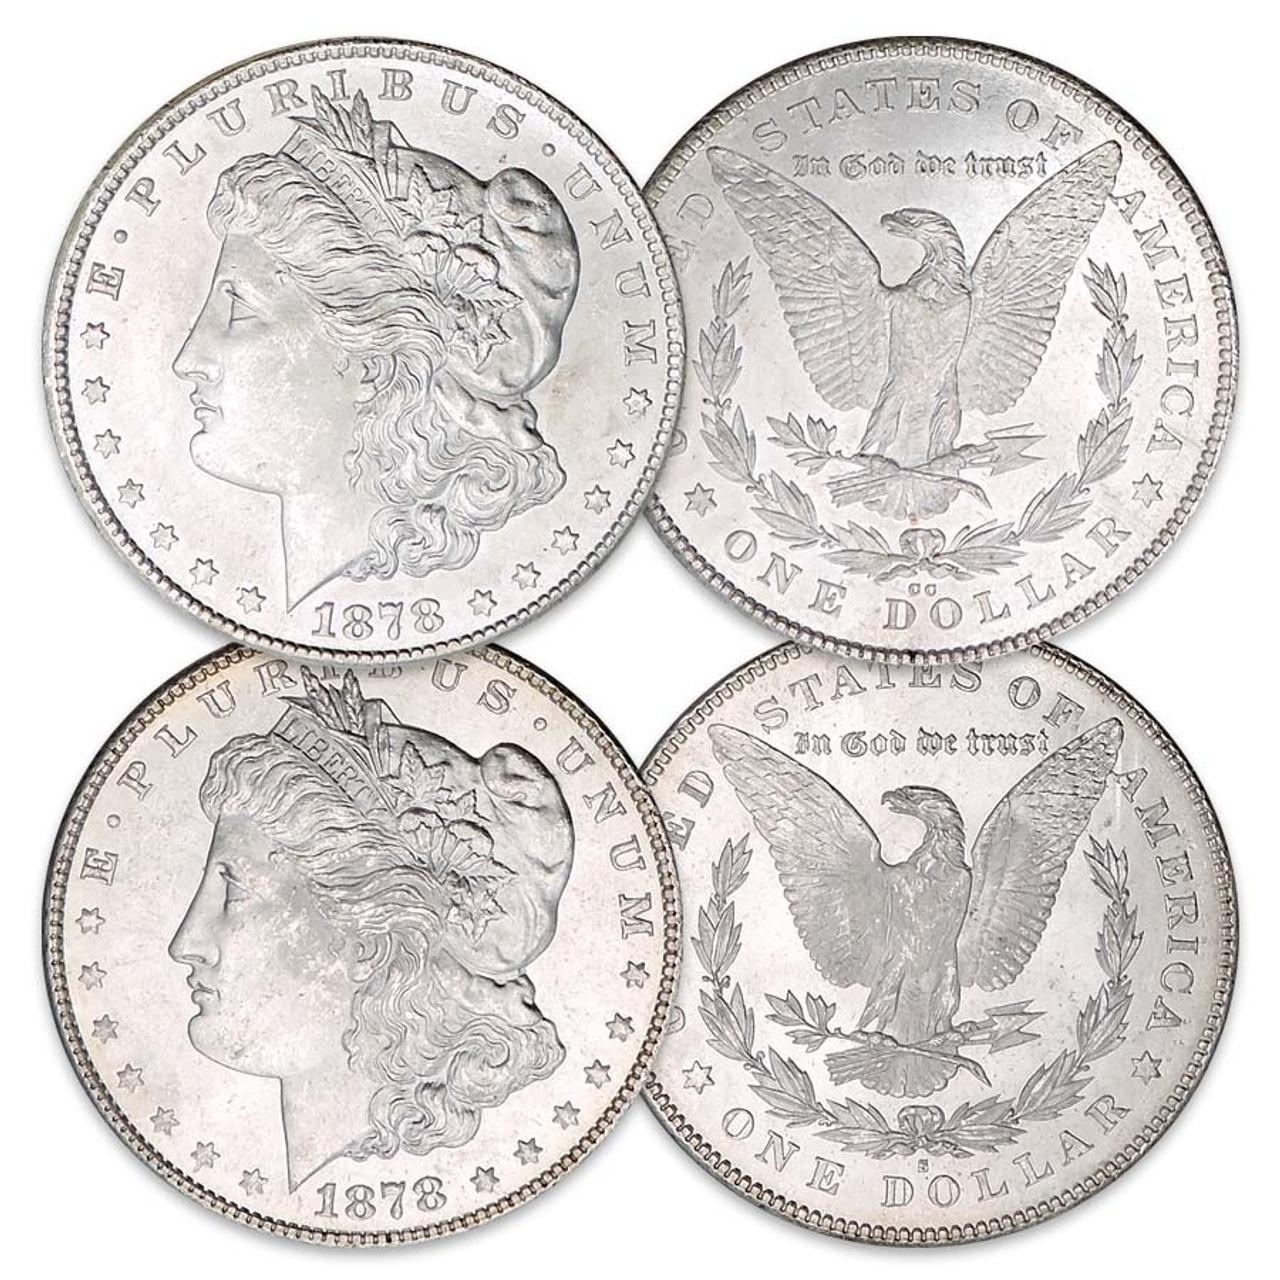 1878-CC Morgan Silver Dollar Brilliant Uncirculated with FREE Morgan Silver Dollar